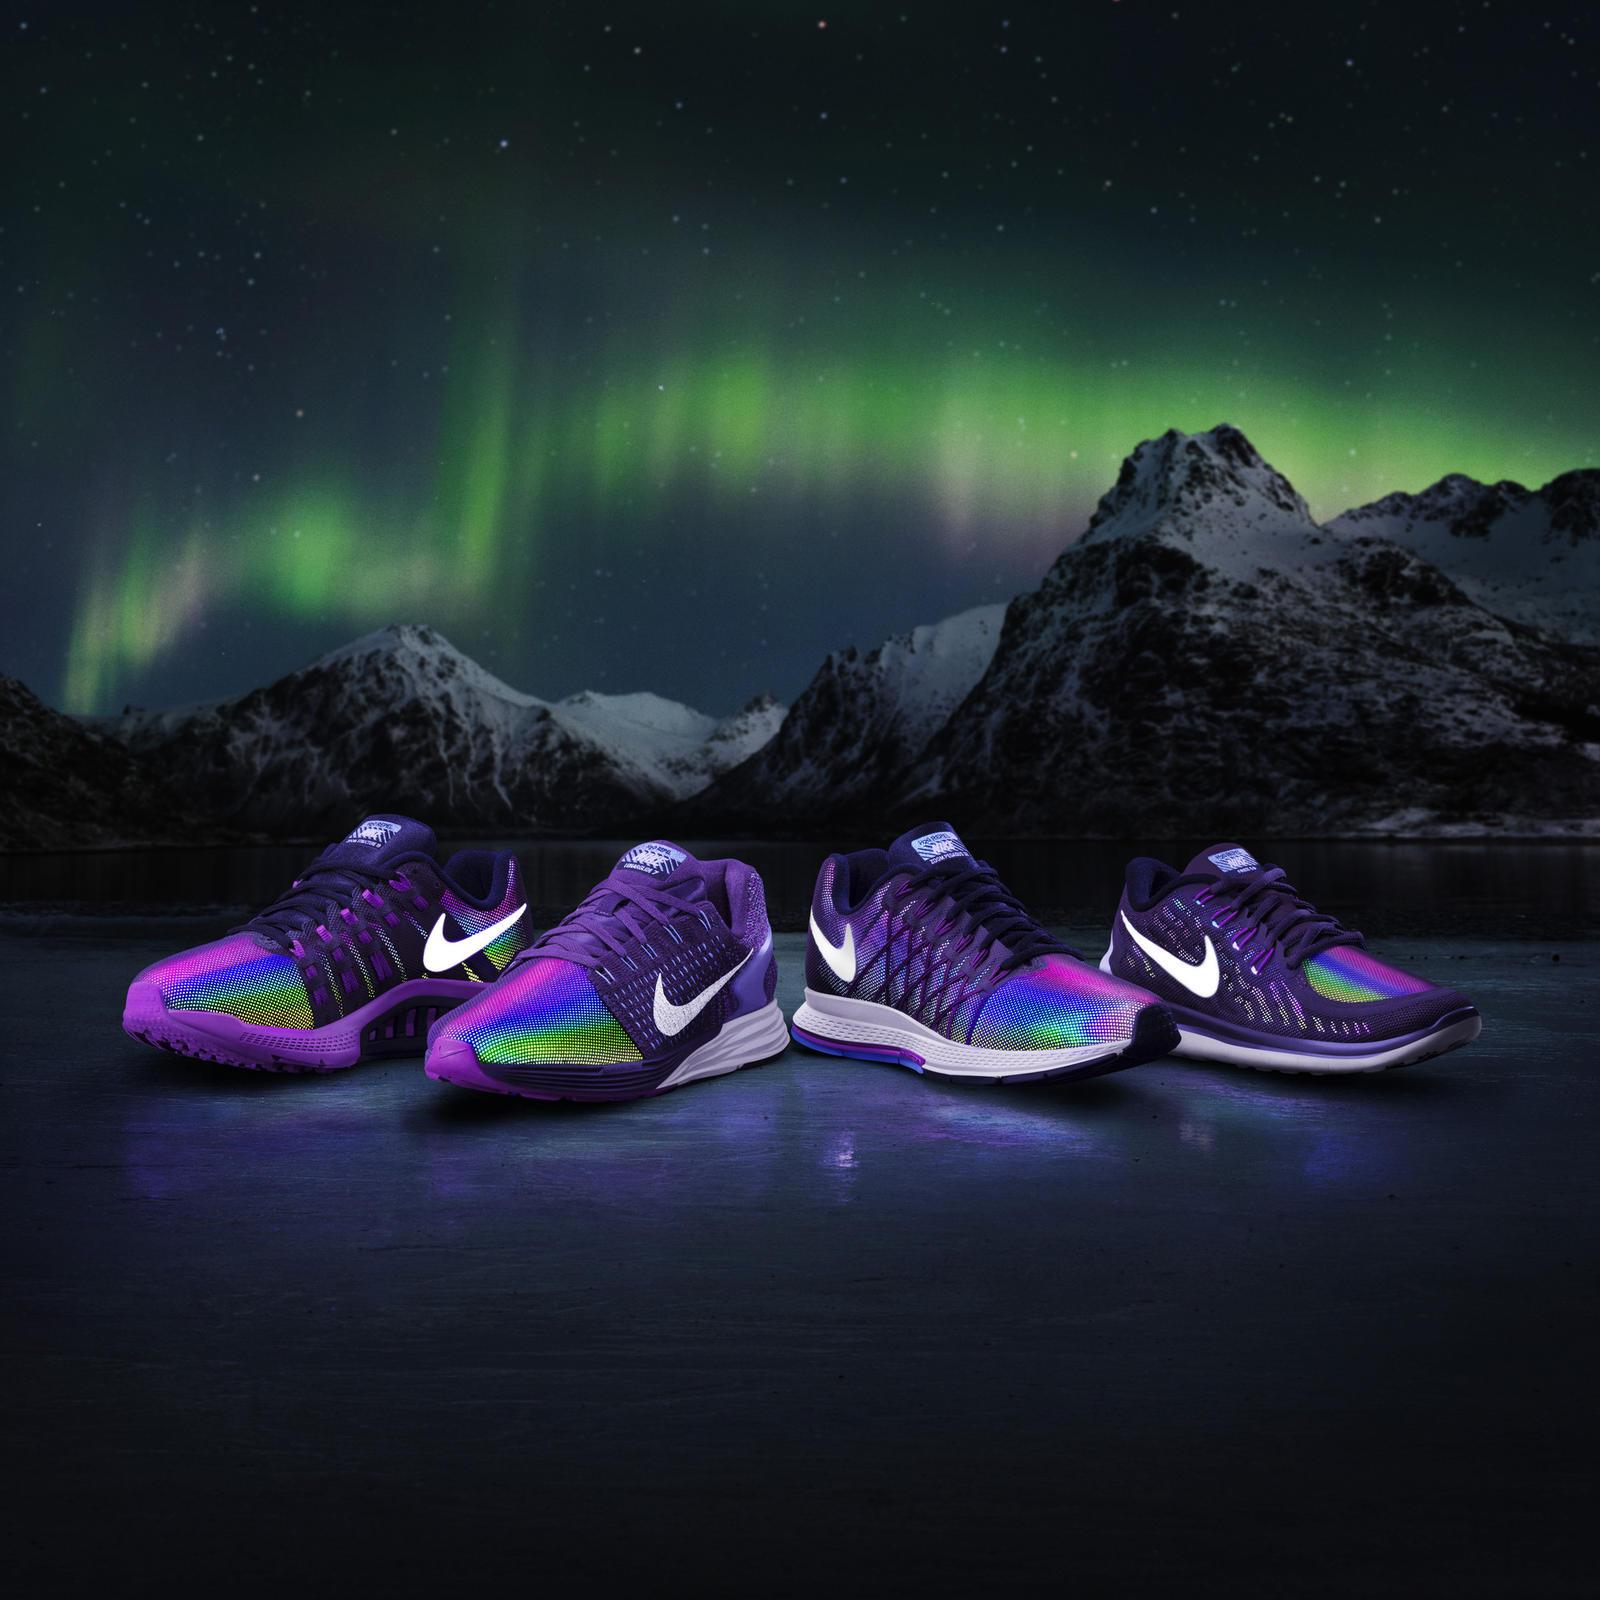 Nike_Flash_Footwear_Family_Womens_native_1600